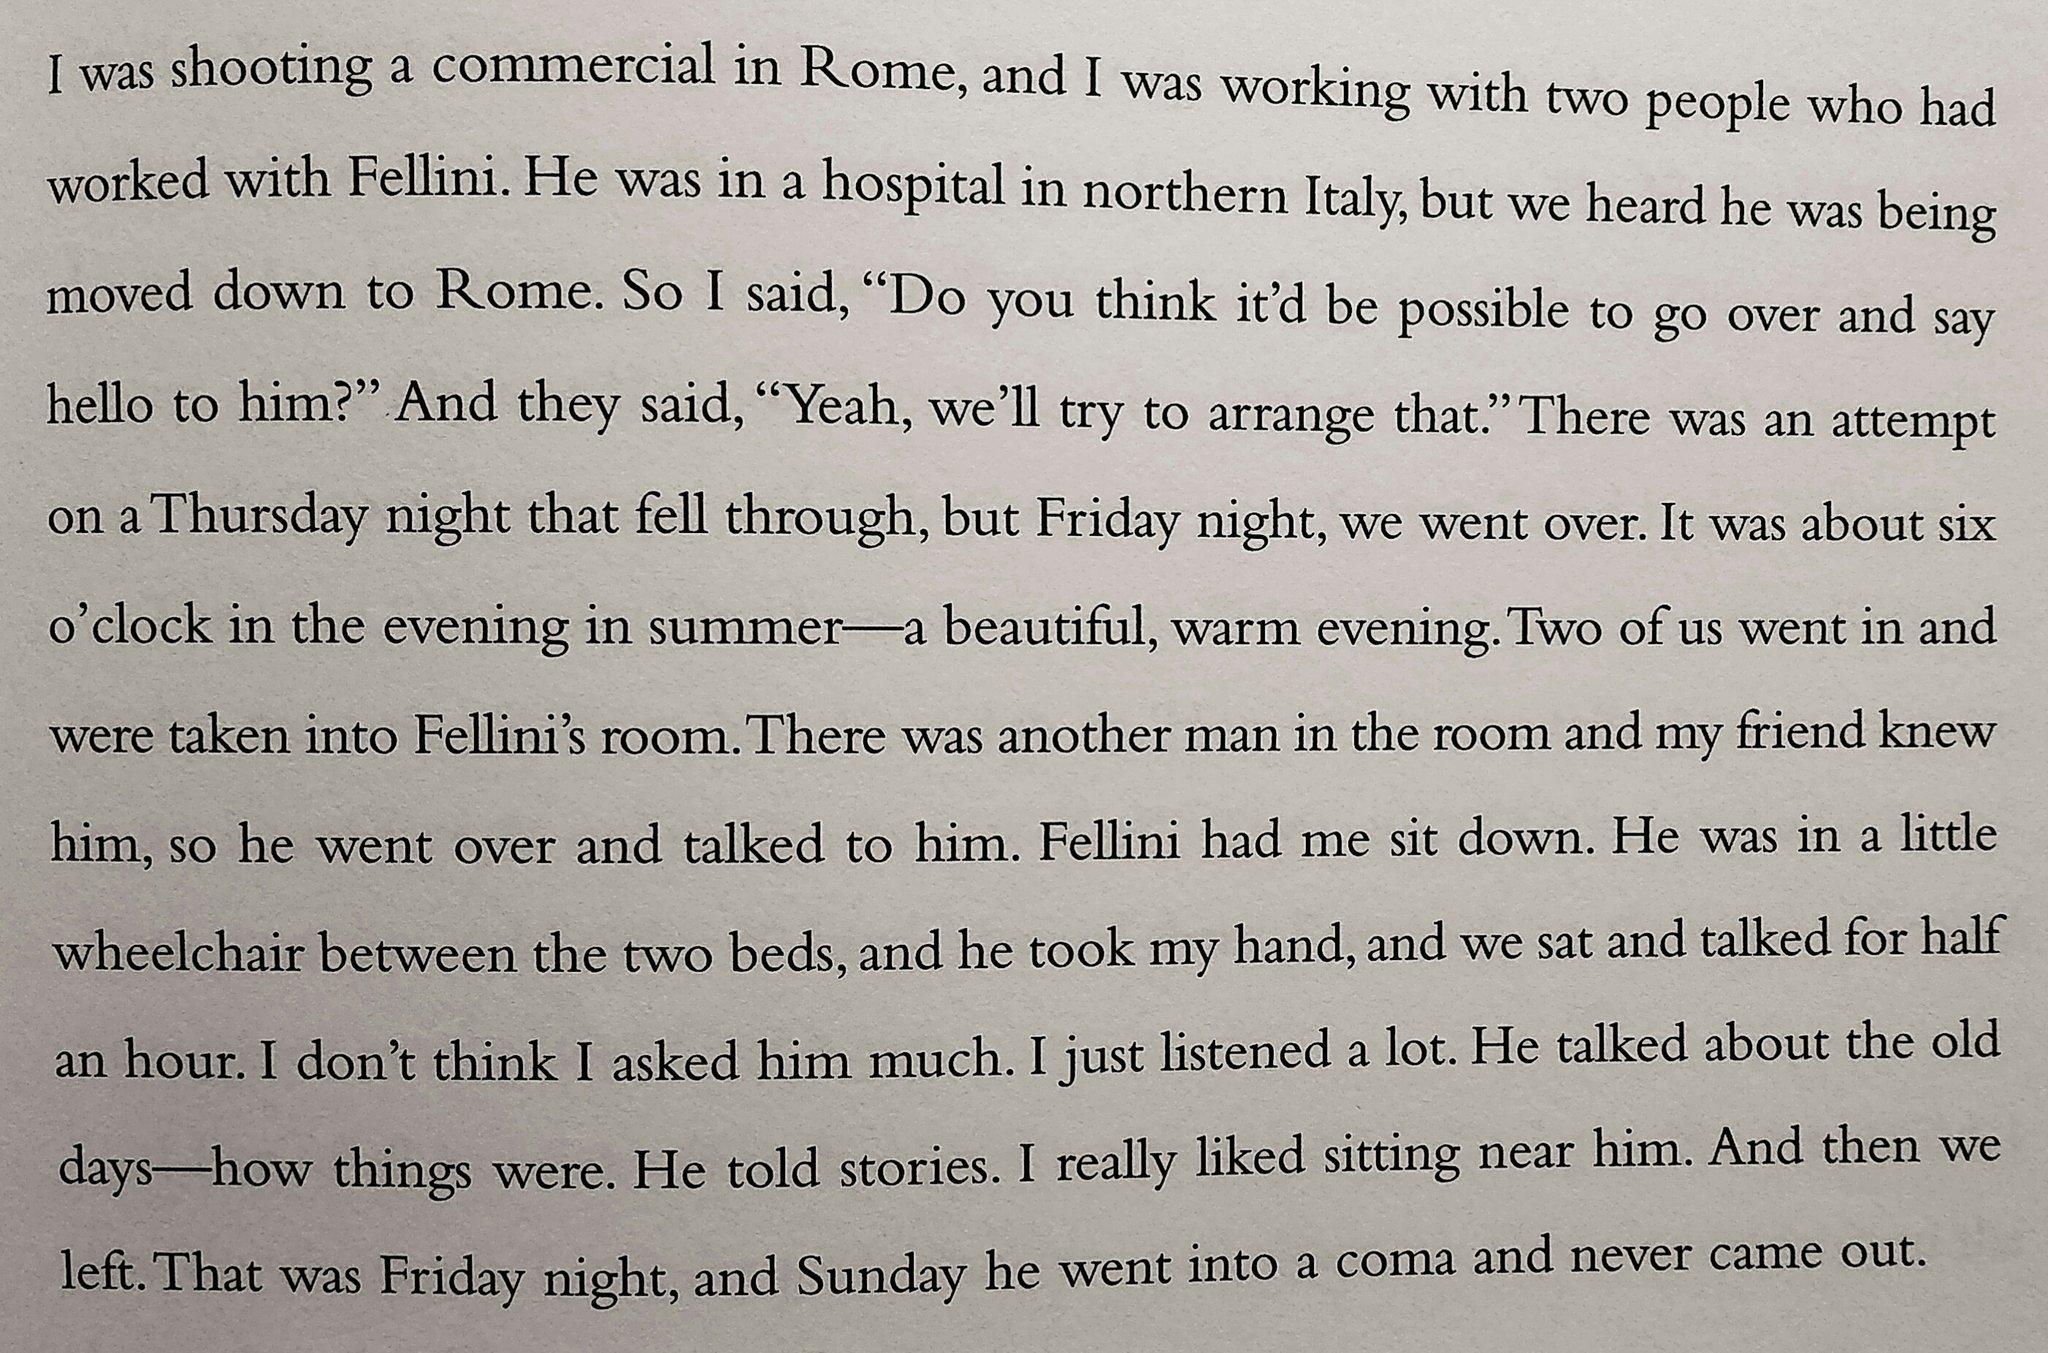 RT @mccrabb_will: David Lynch on meeting Fellini https://t.co/LpEnwELt2h